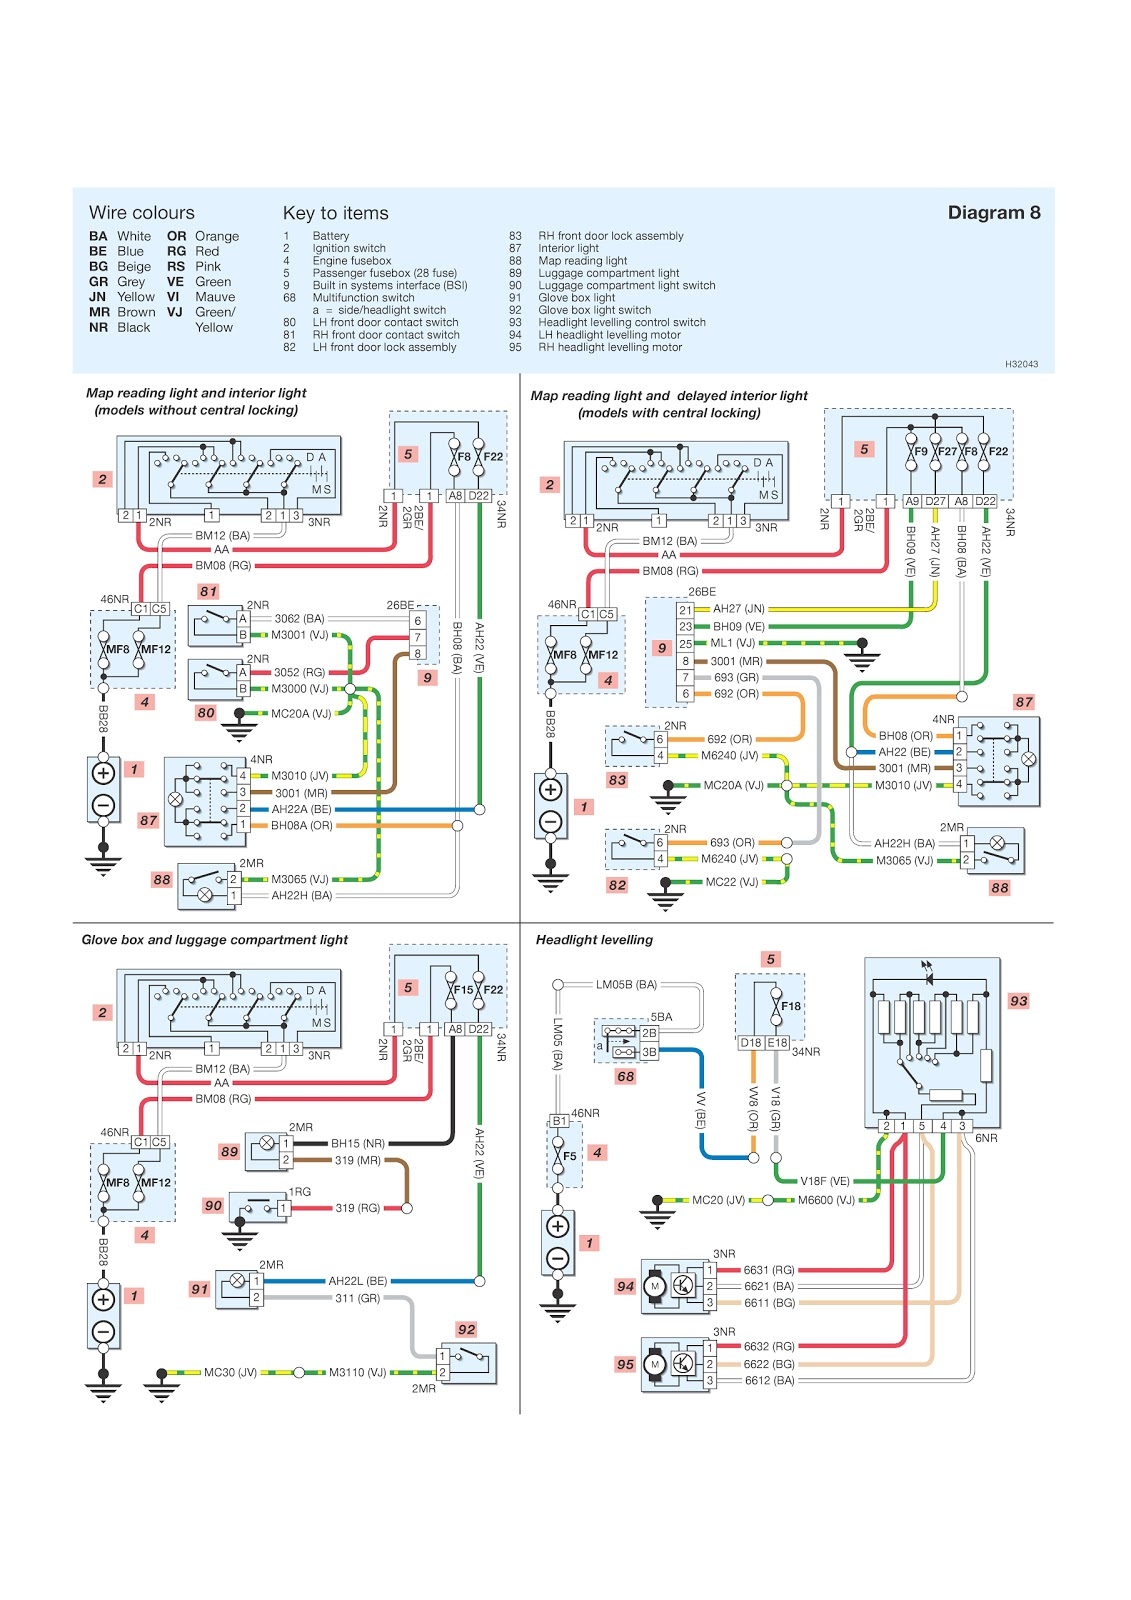 Peugeot 206 Wiring Diagram Robertshaw Thermostat Schematic Interior Lighting Continued